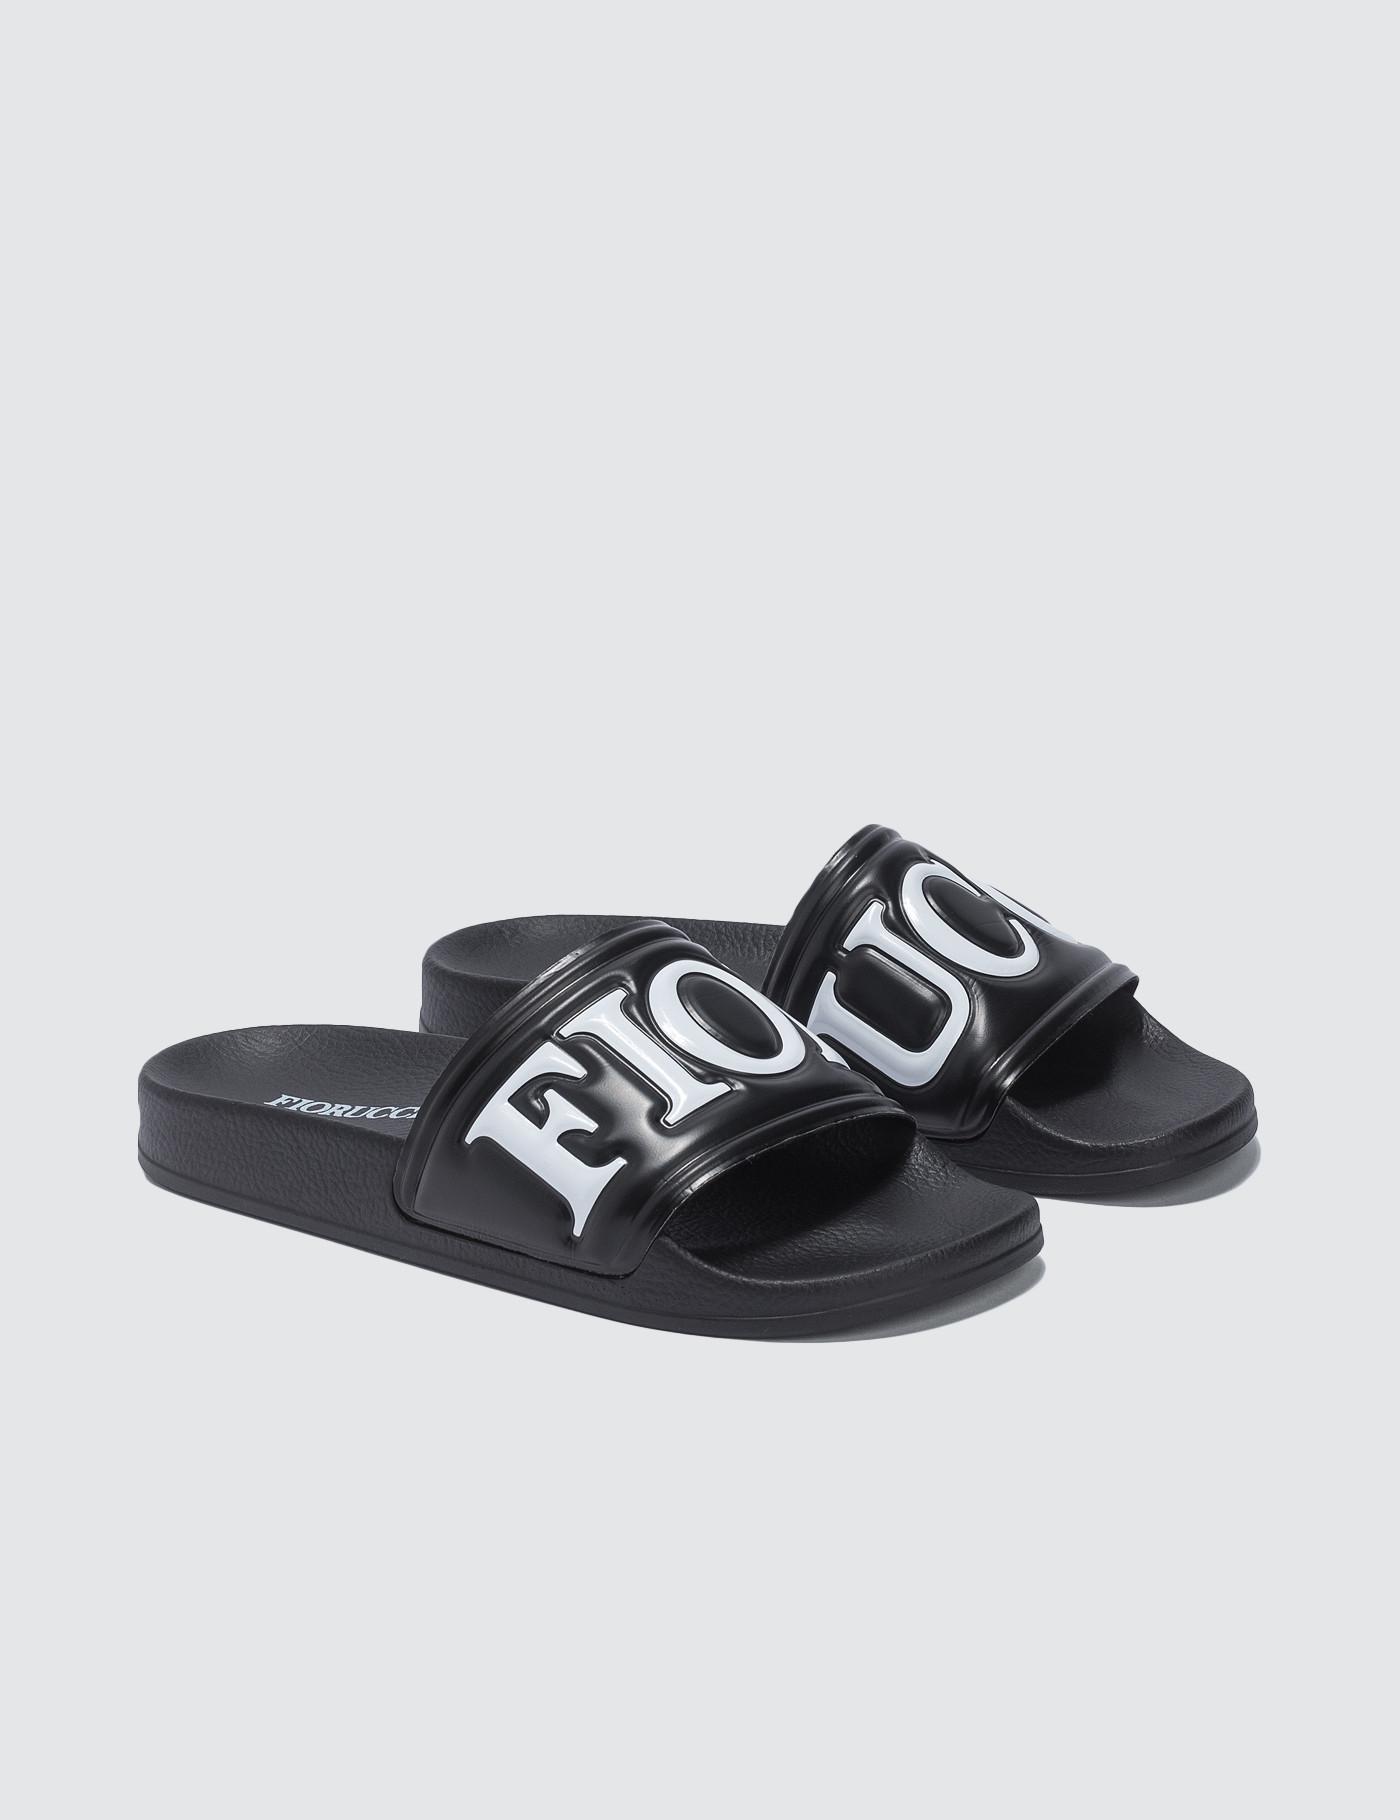 5bcc9c71300 Fiorucci Rubber Slides in Black - Lyst